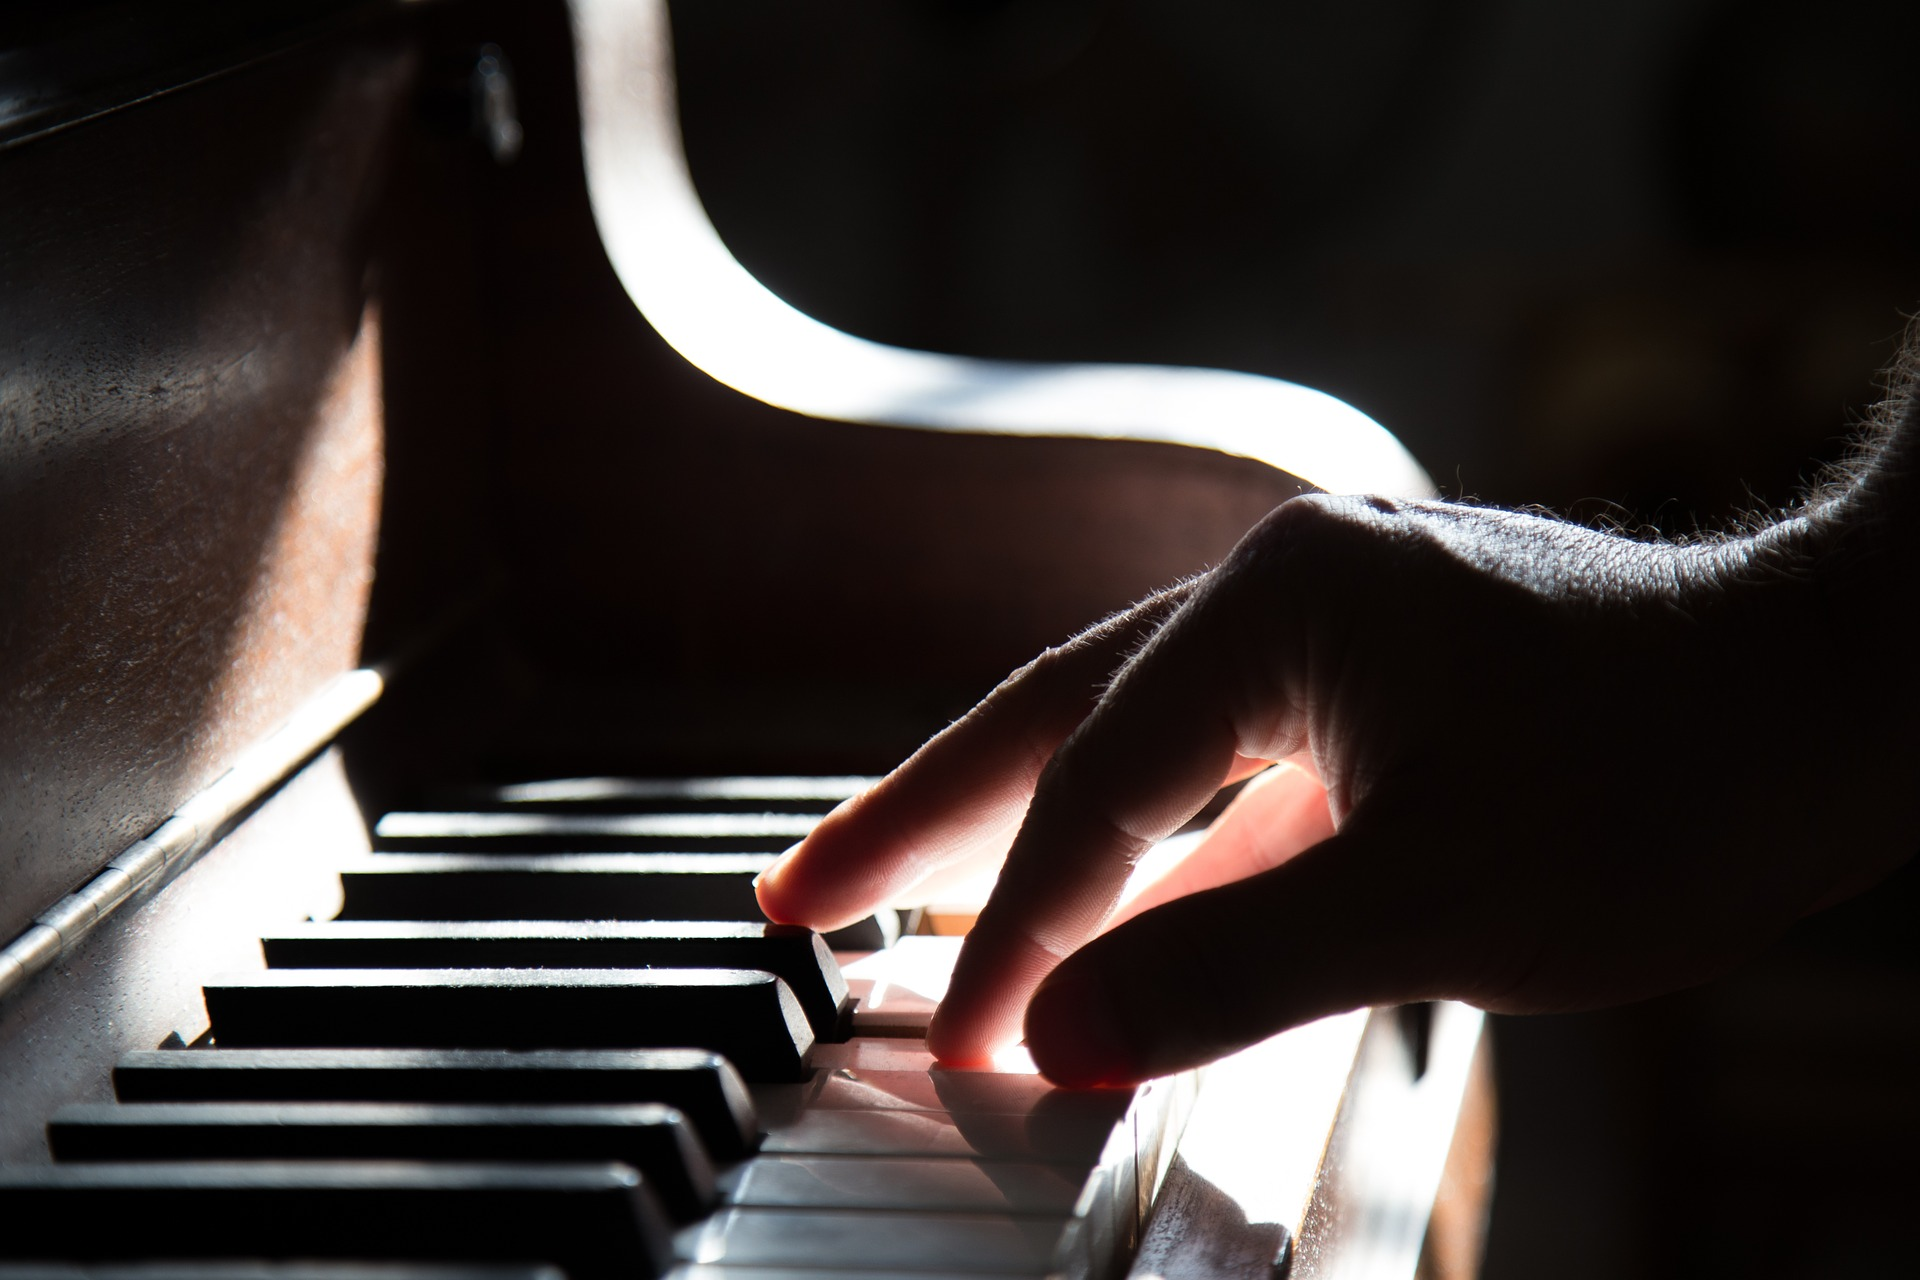 Sagra Musicale Stazzemese, una rassegna lunga cinque mesi